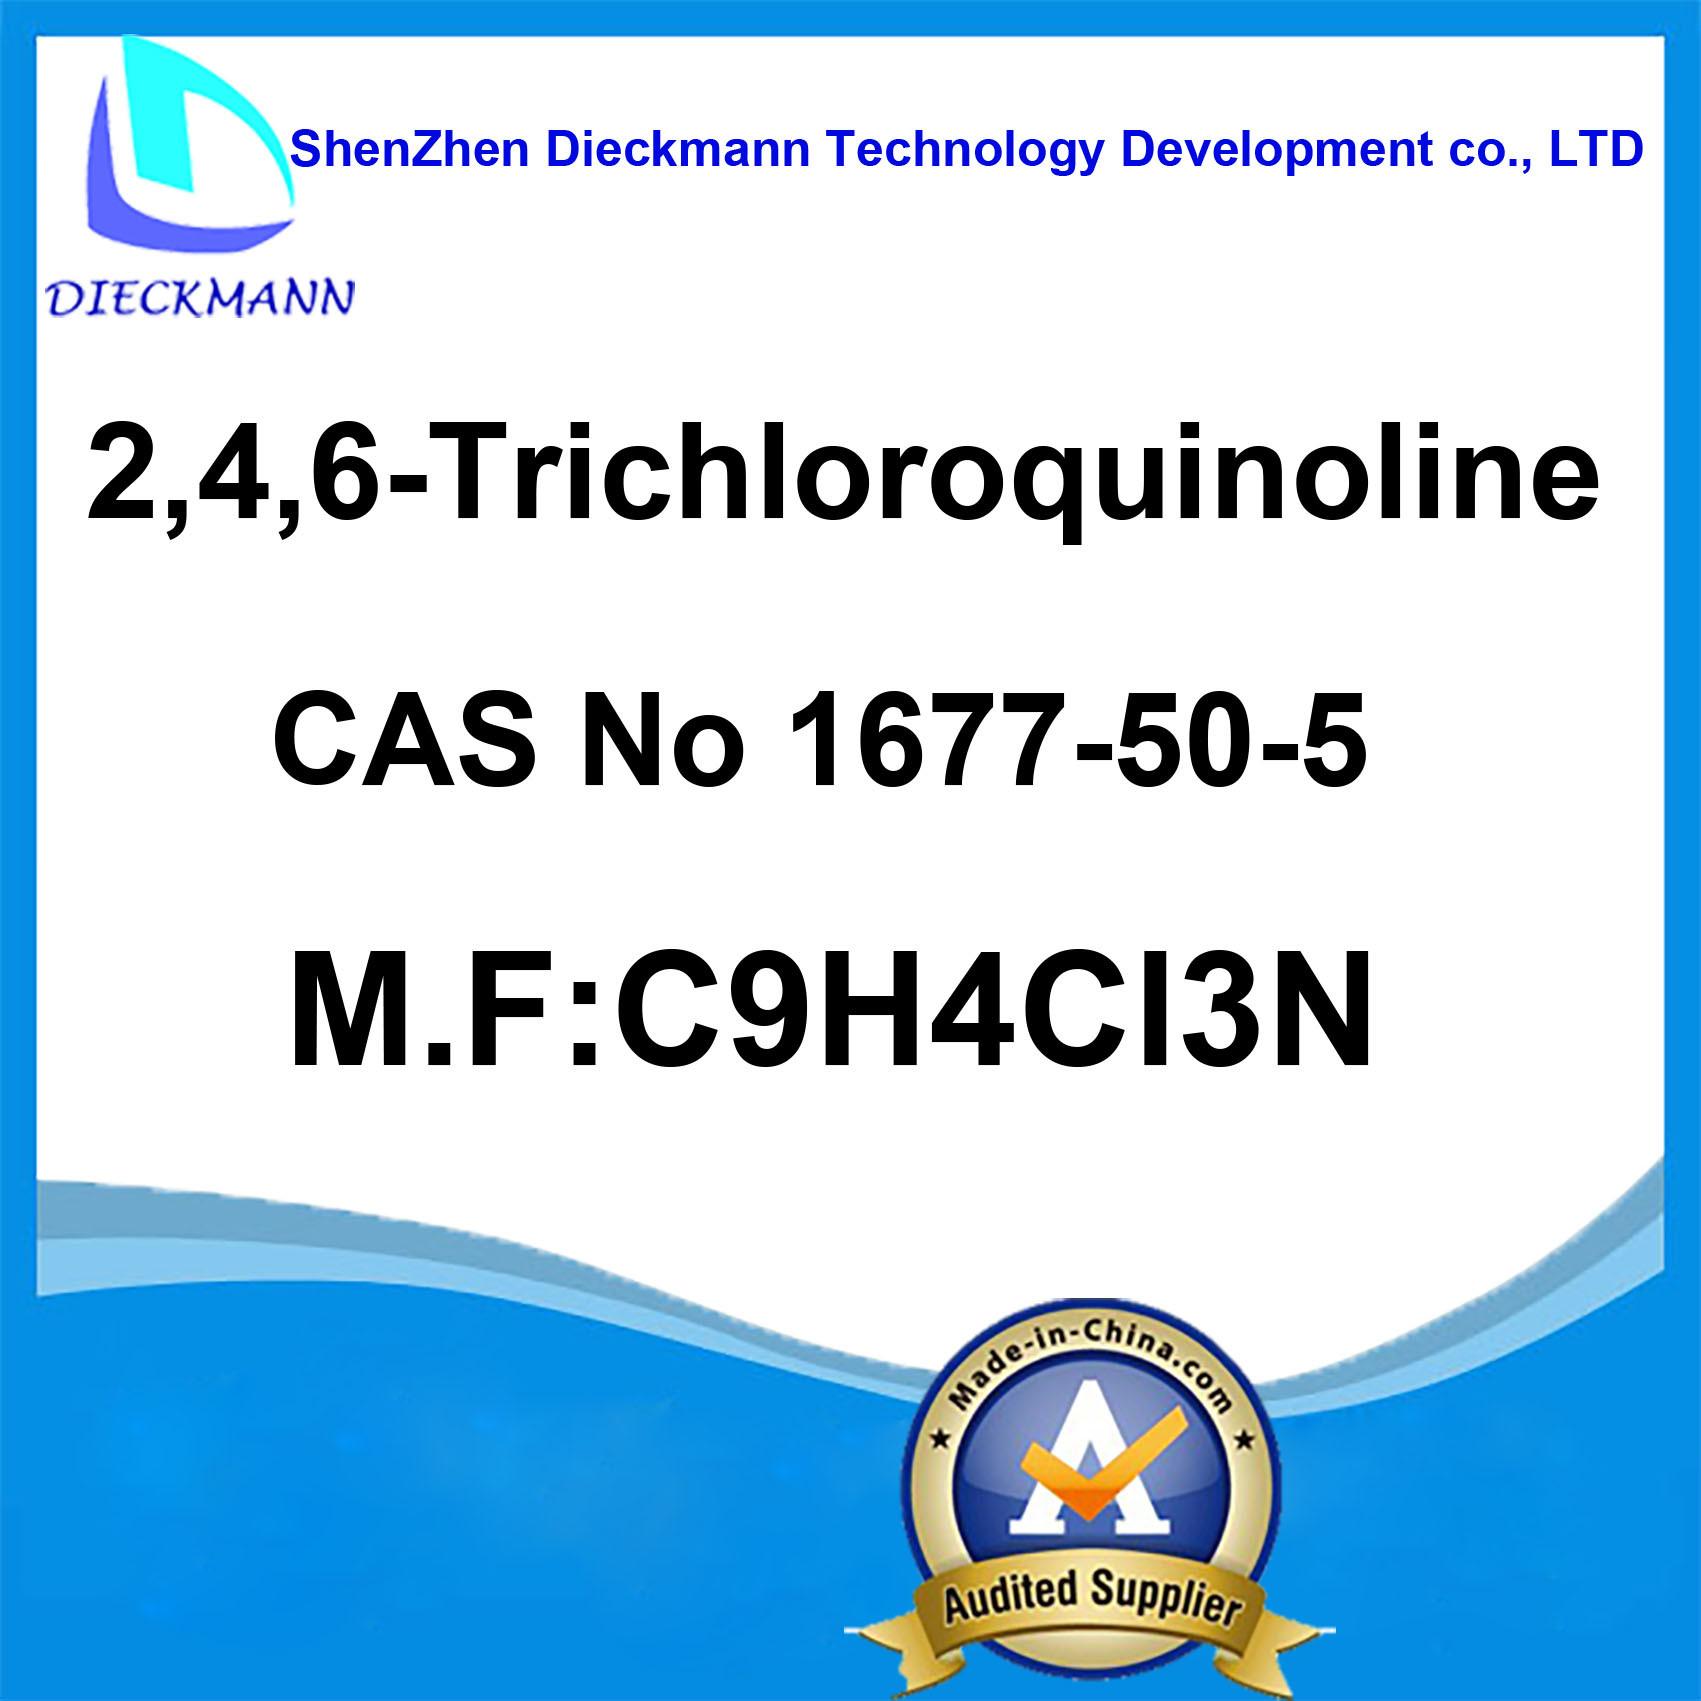 2, 4, 6-Trichloroquinoline CAS No 1677-50-5